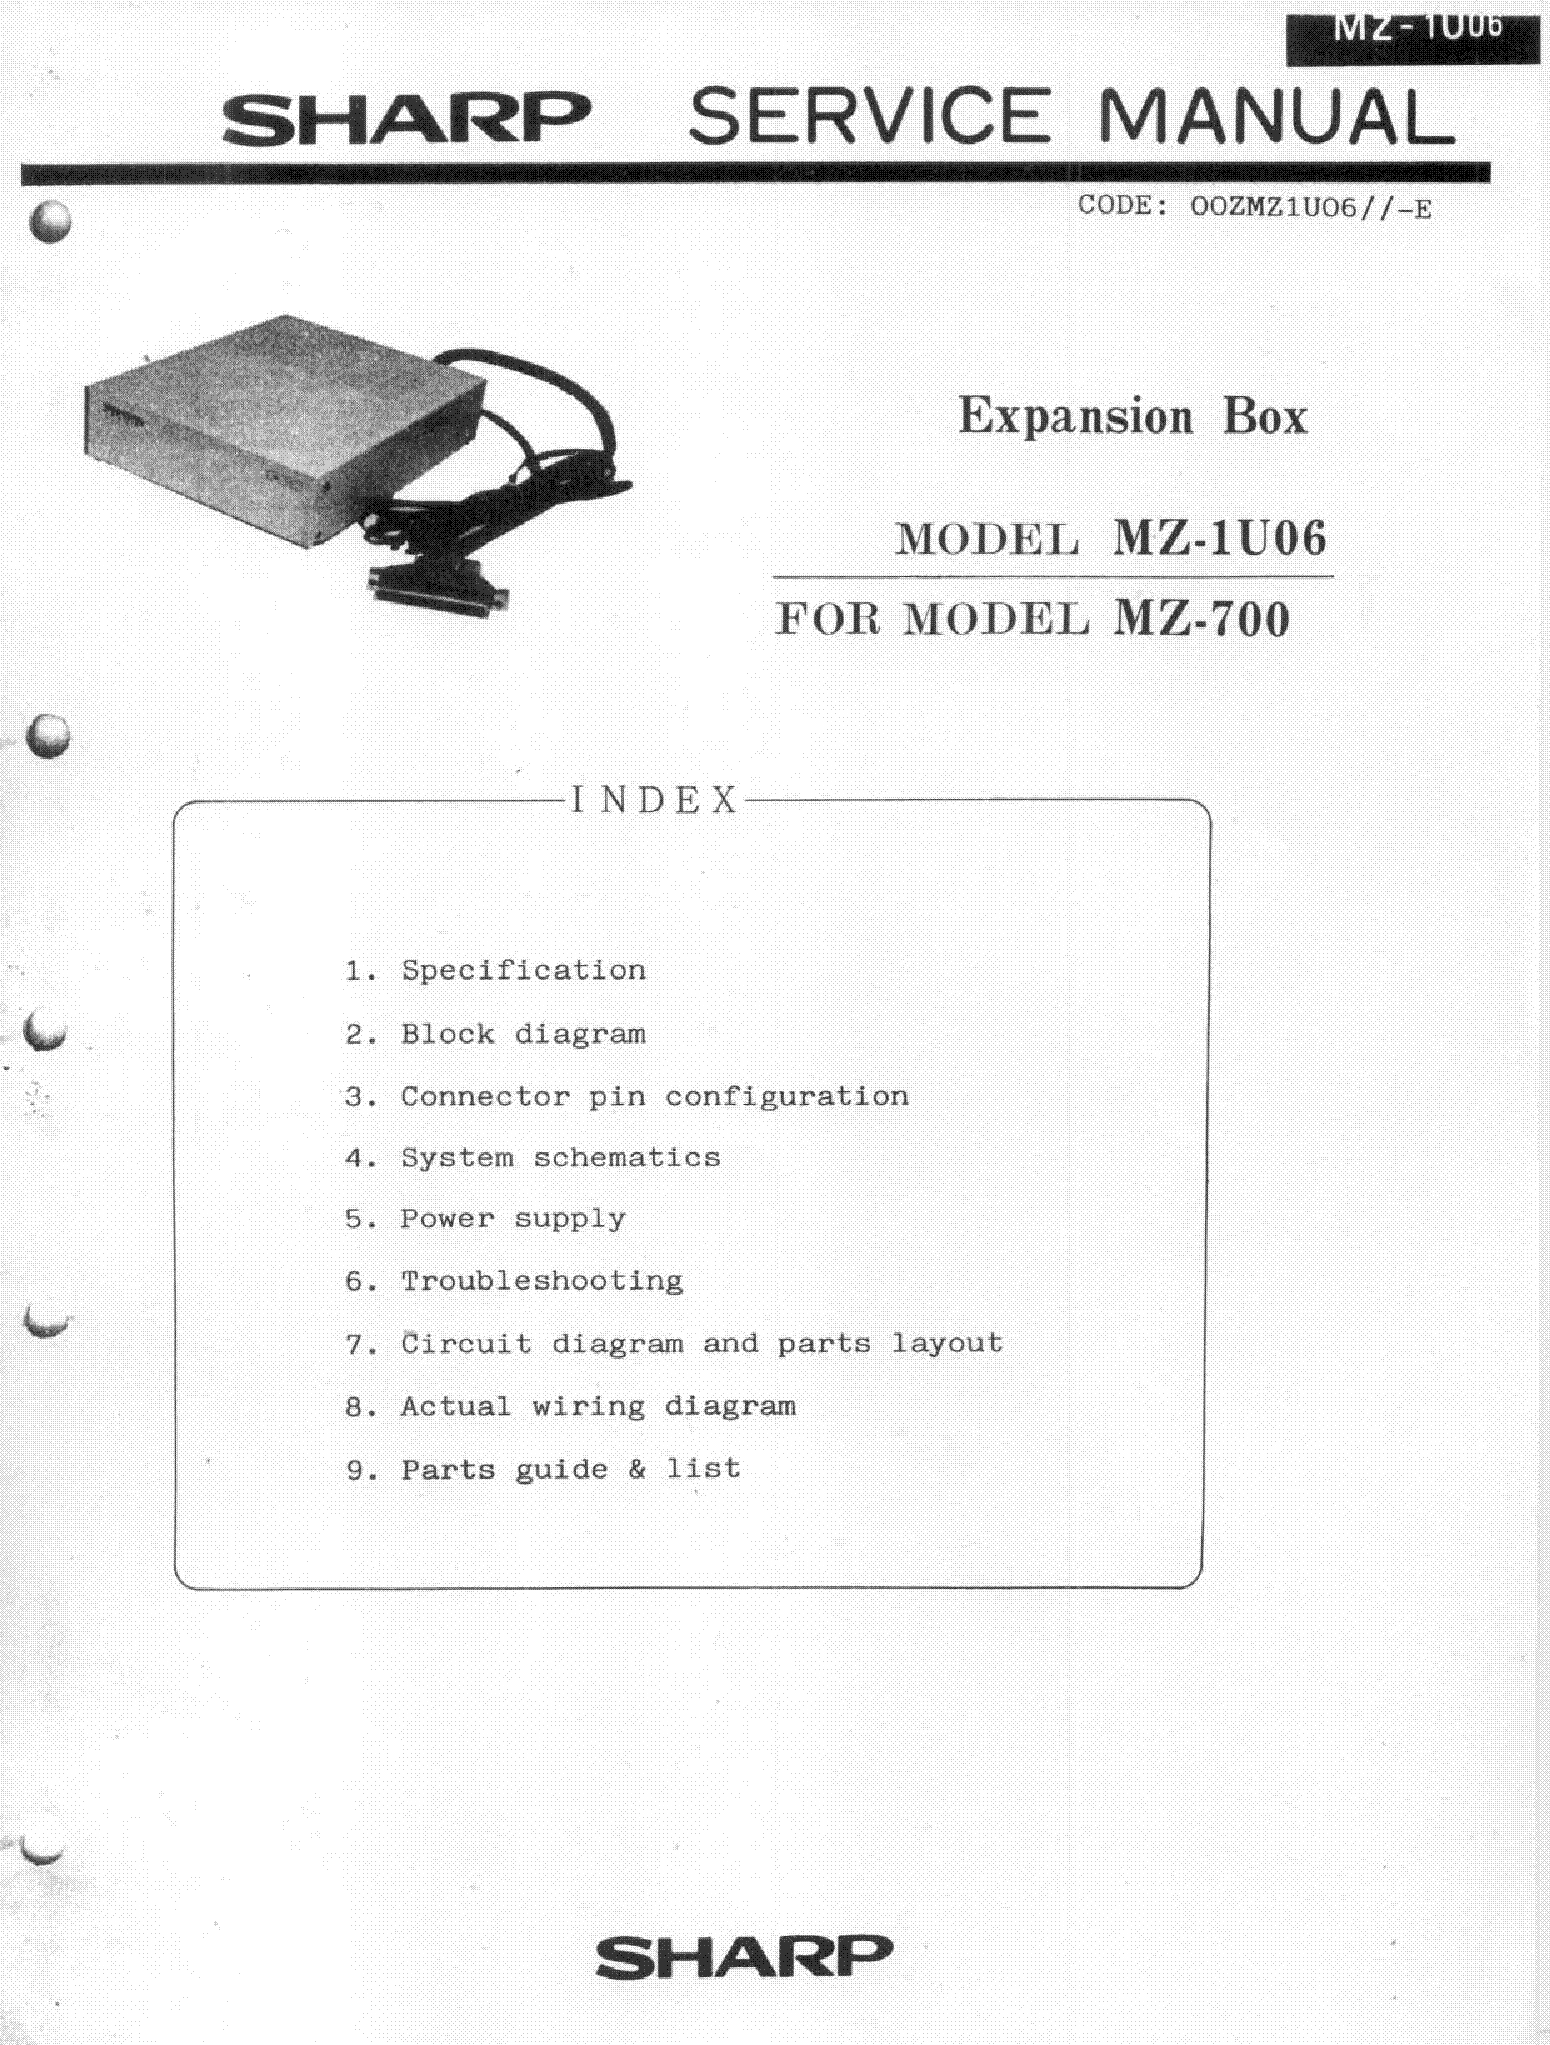 SHARP MZ-1U06 service manual (1st page)